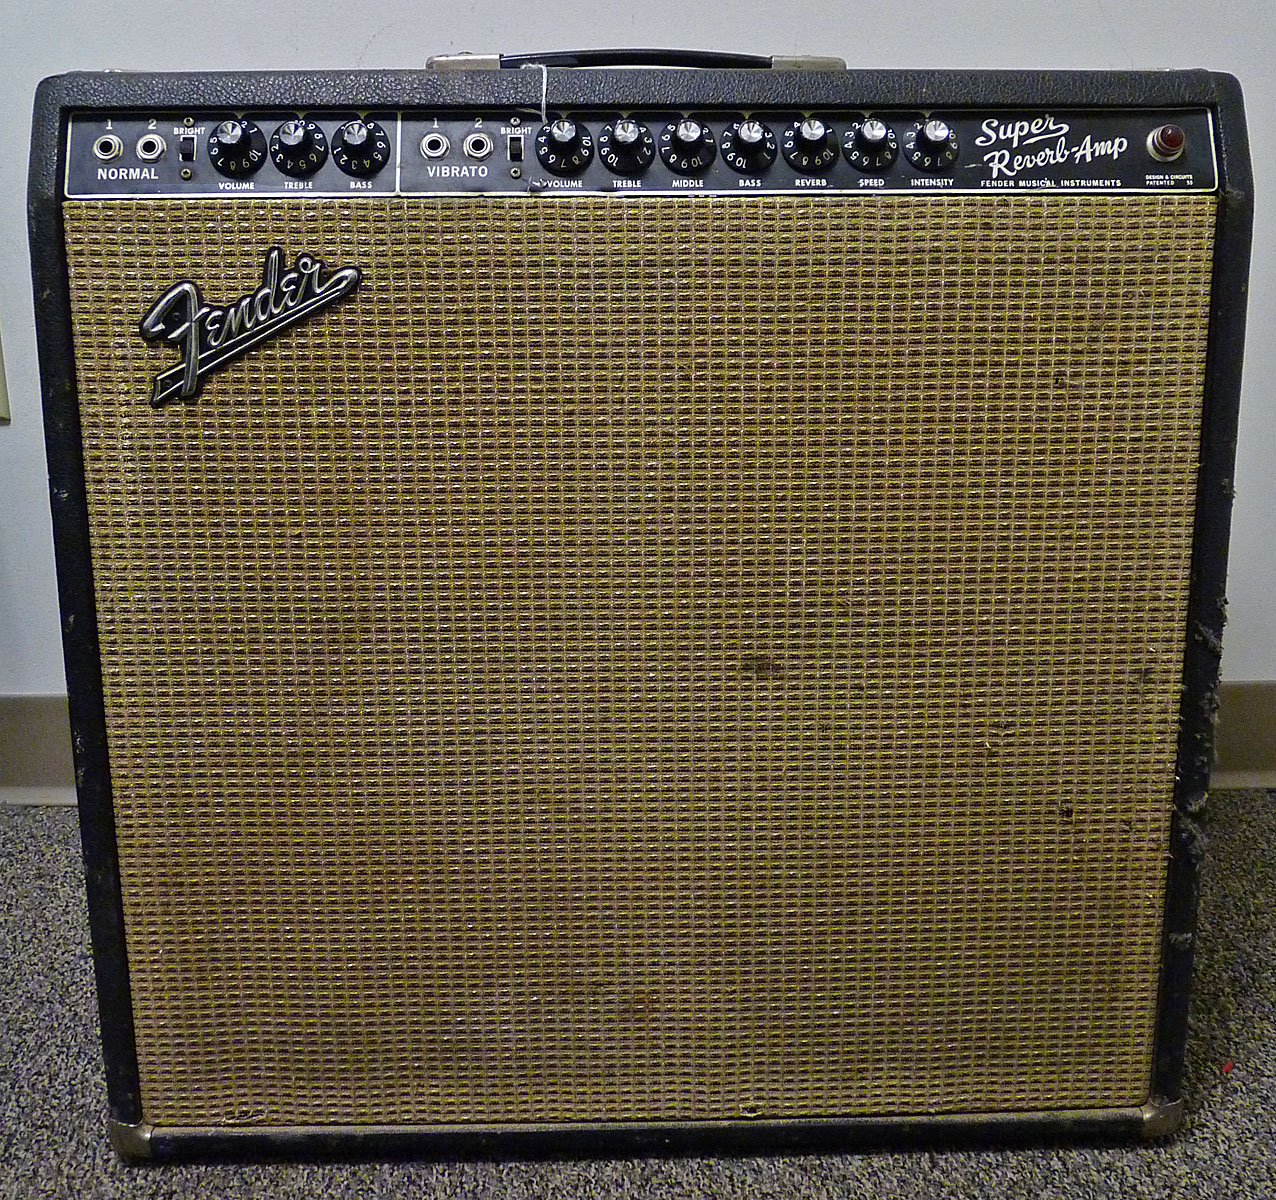 Fender Super Reverb Amp 1967 (USED)